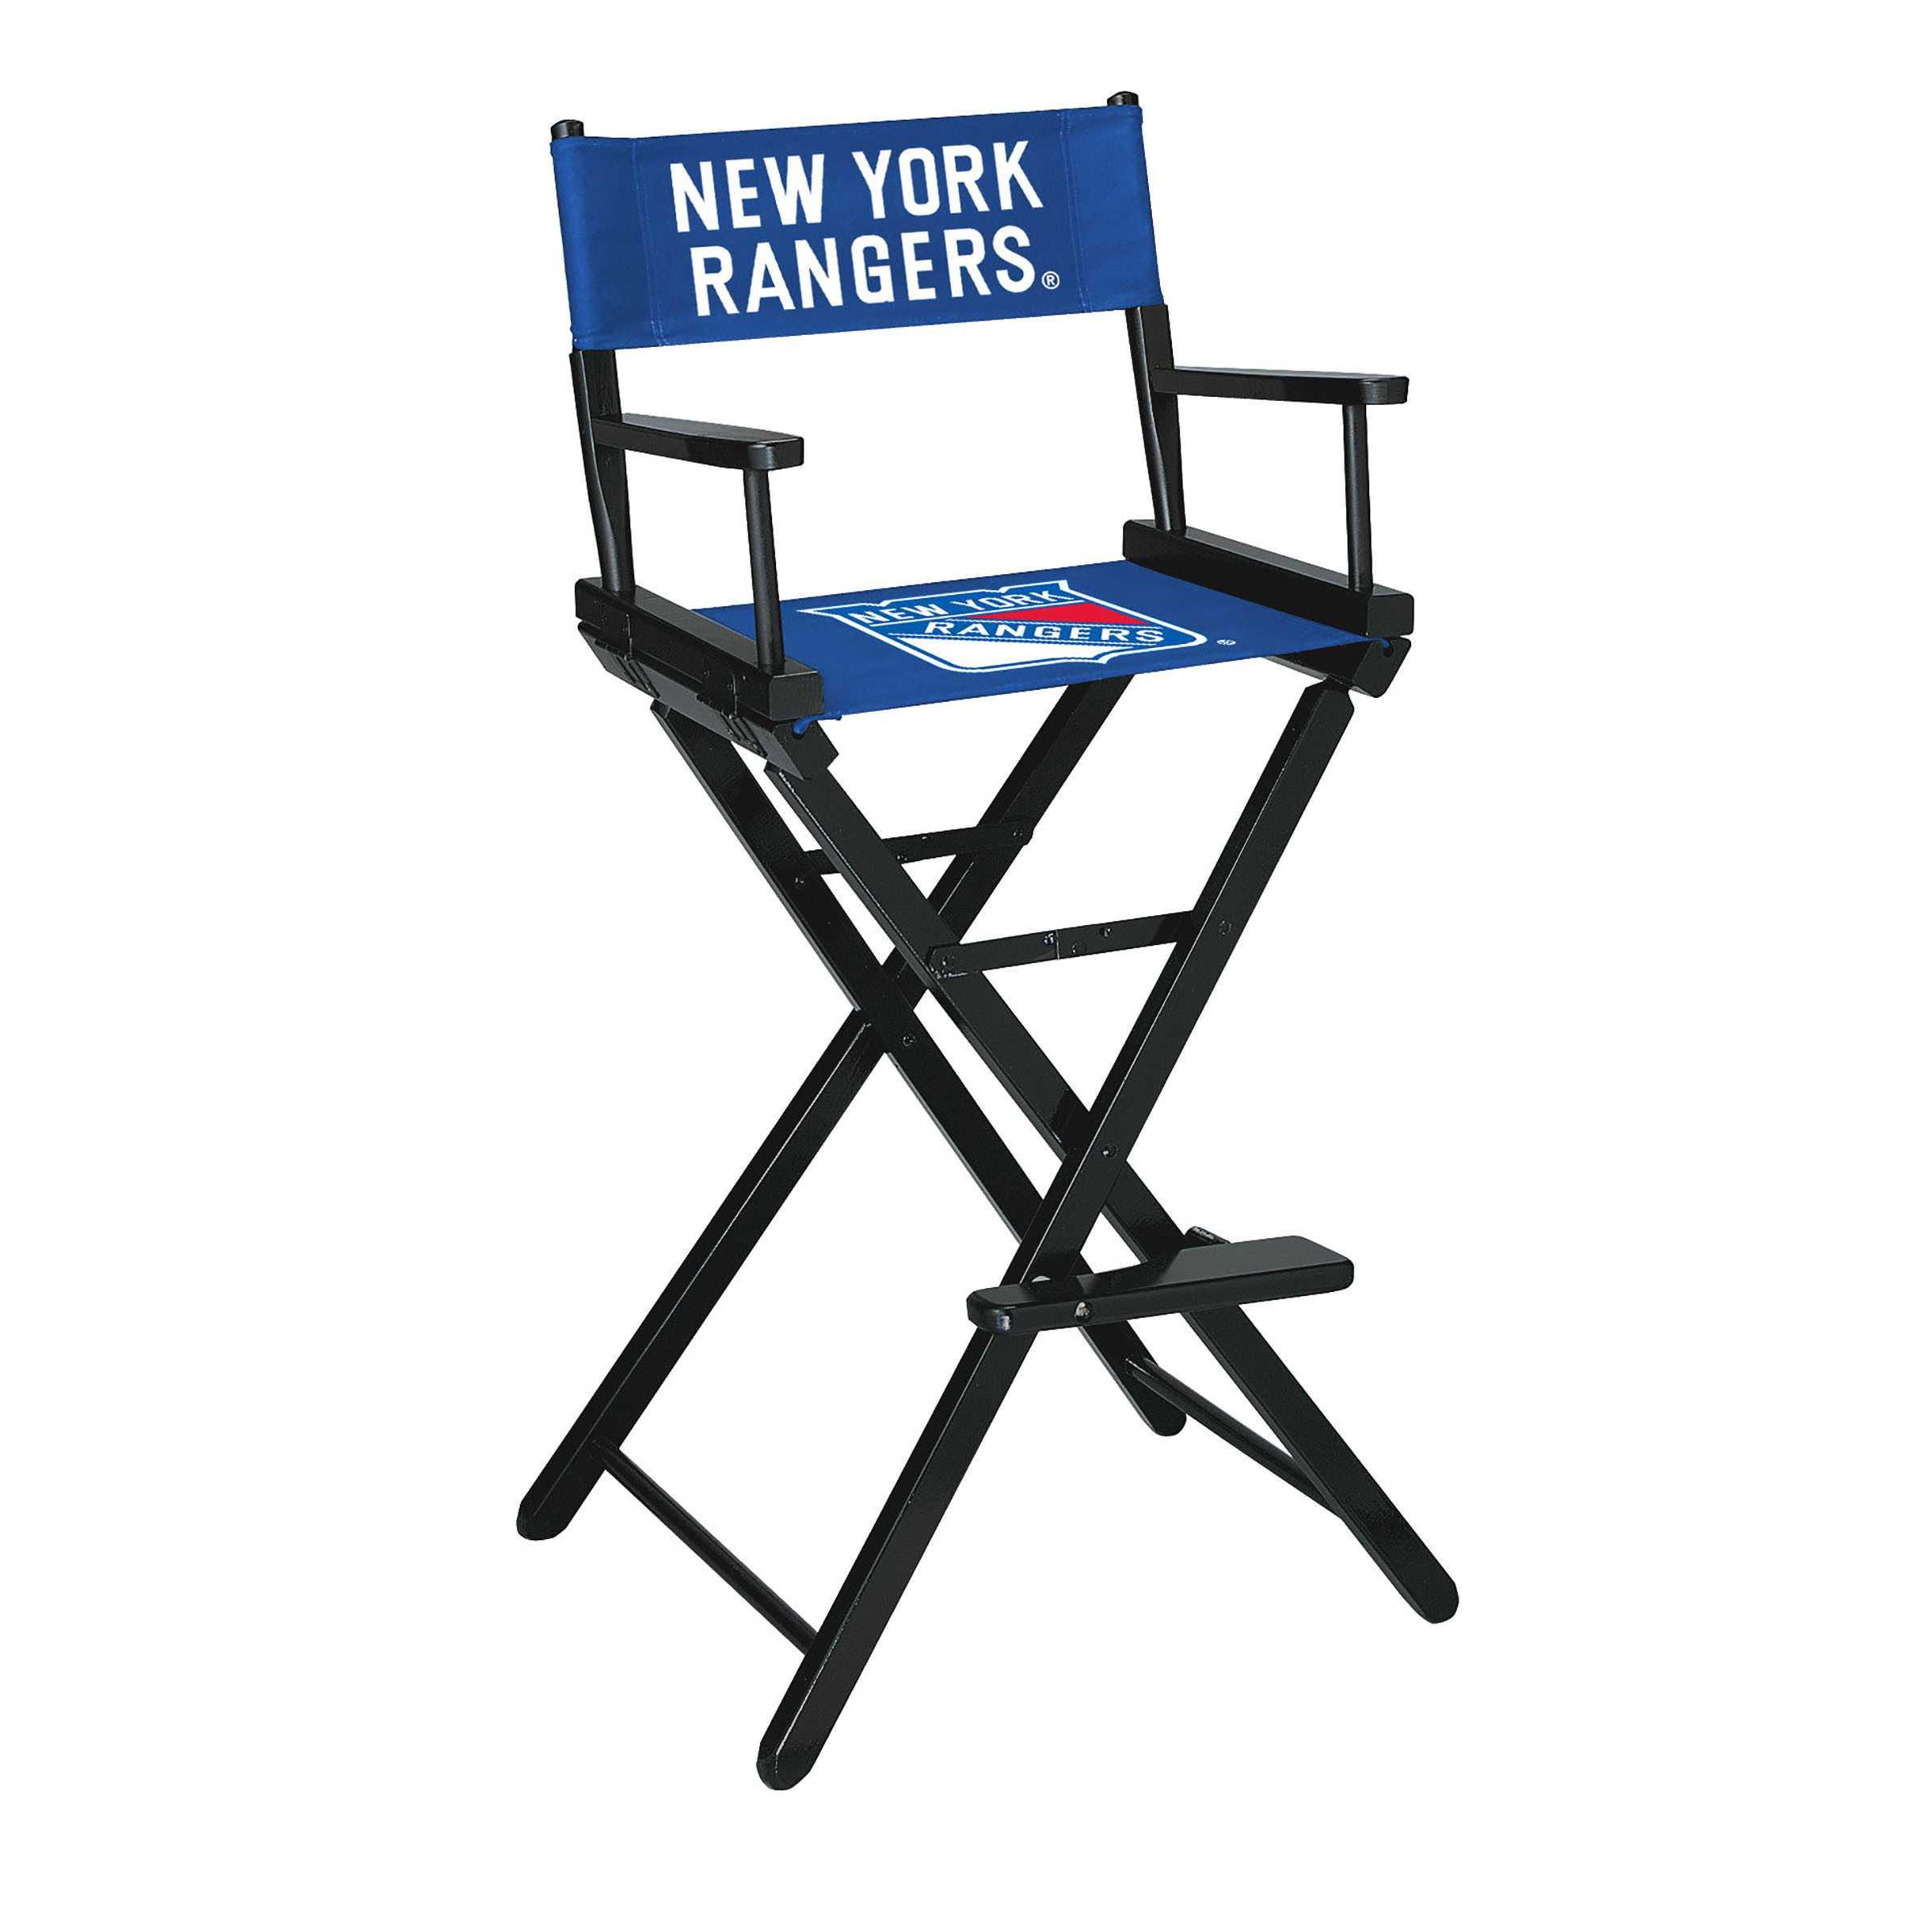 NEW YORK RANGERS BAR HEIGHT DIRECTORS CHAIR